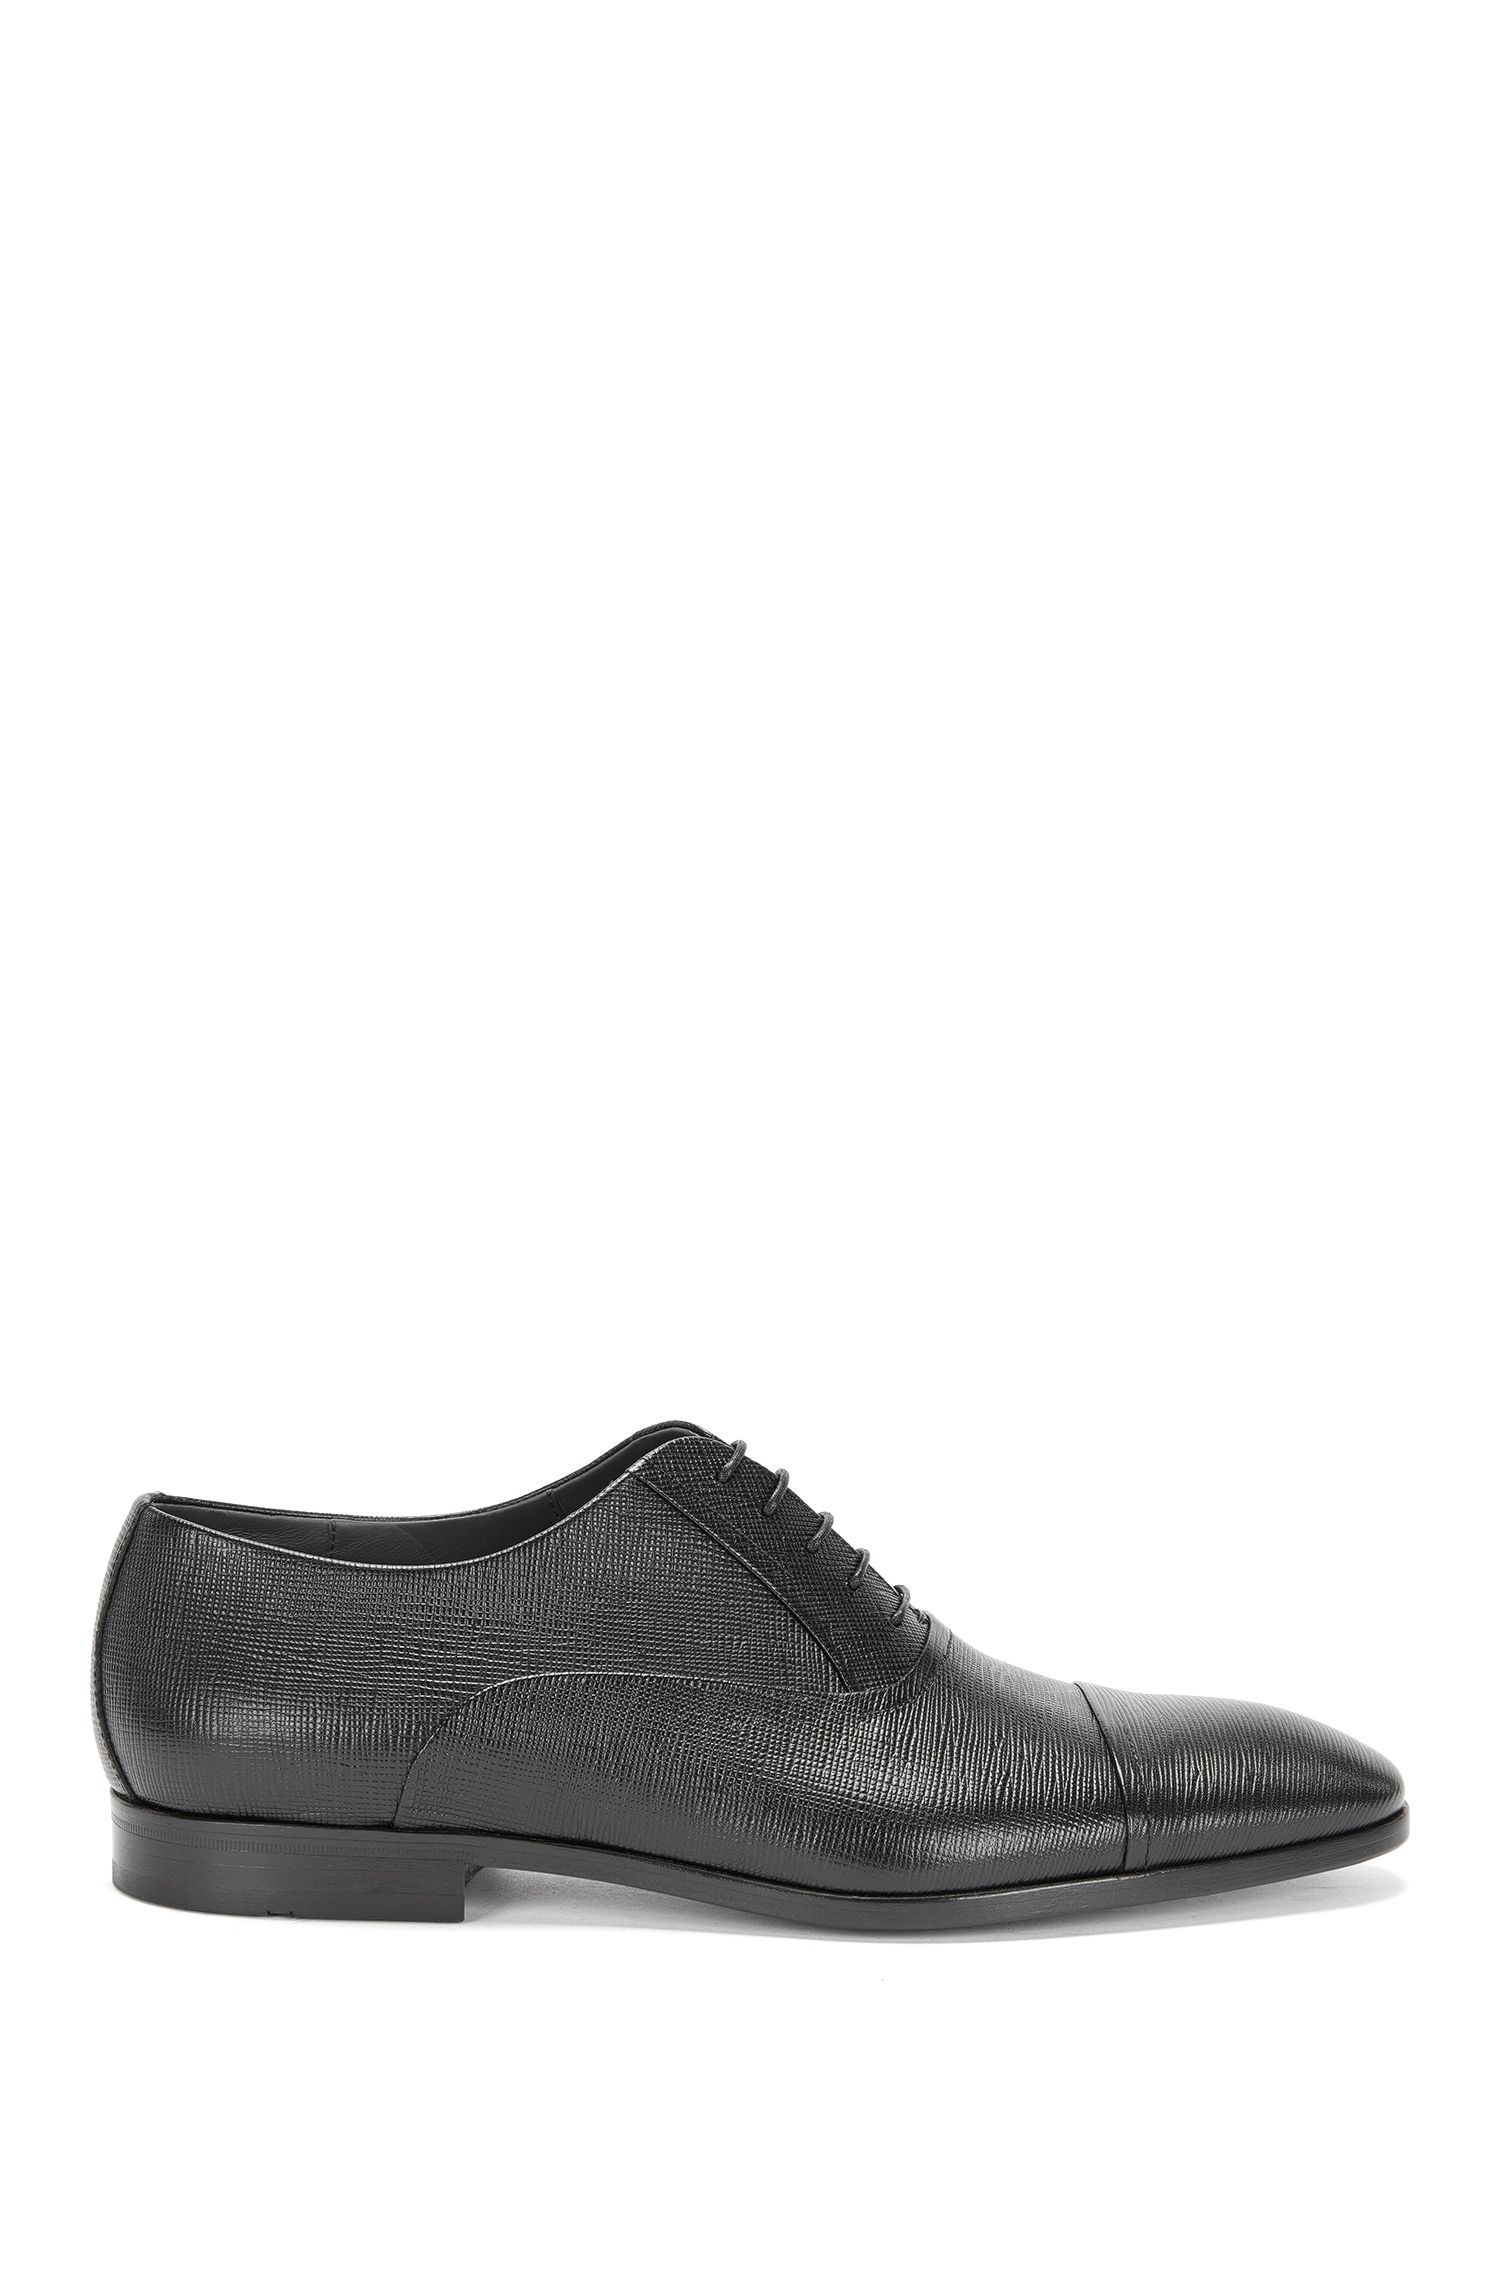 Italian Leather Oxford Dress Shoe | Eveprin